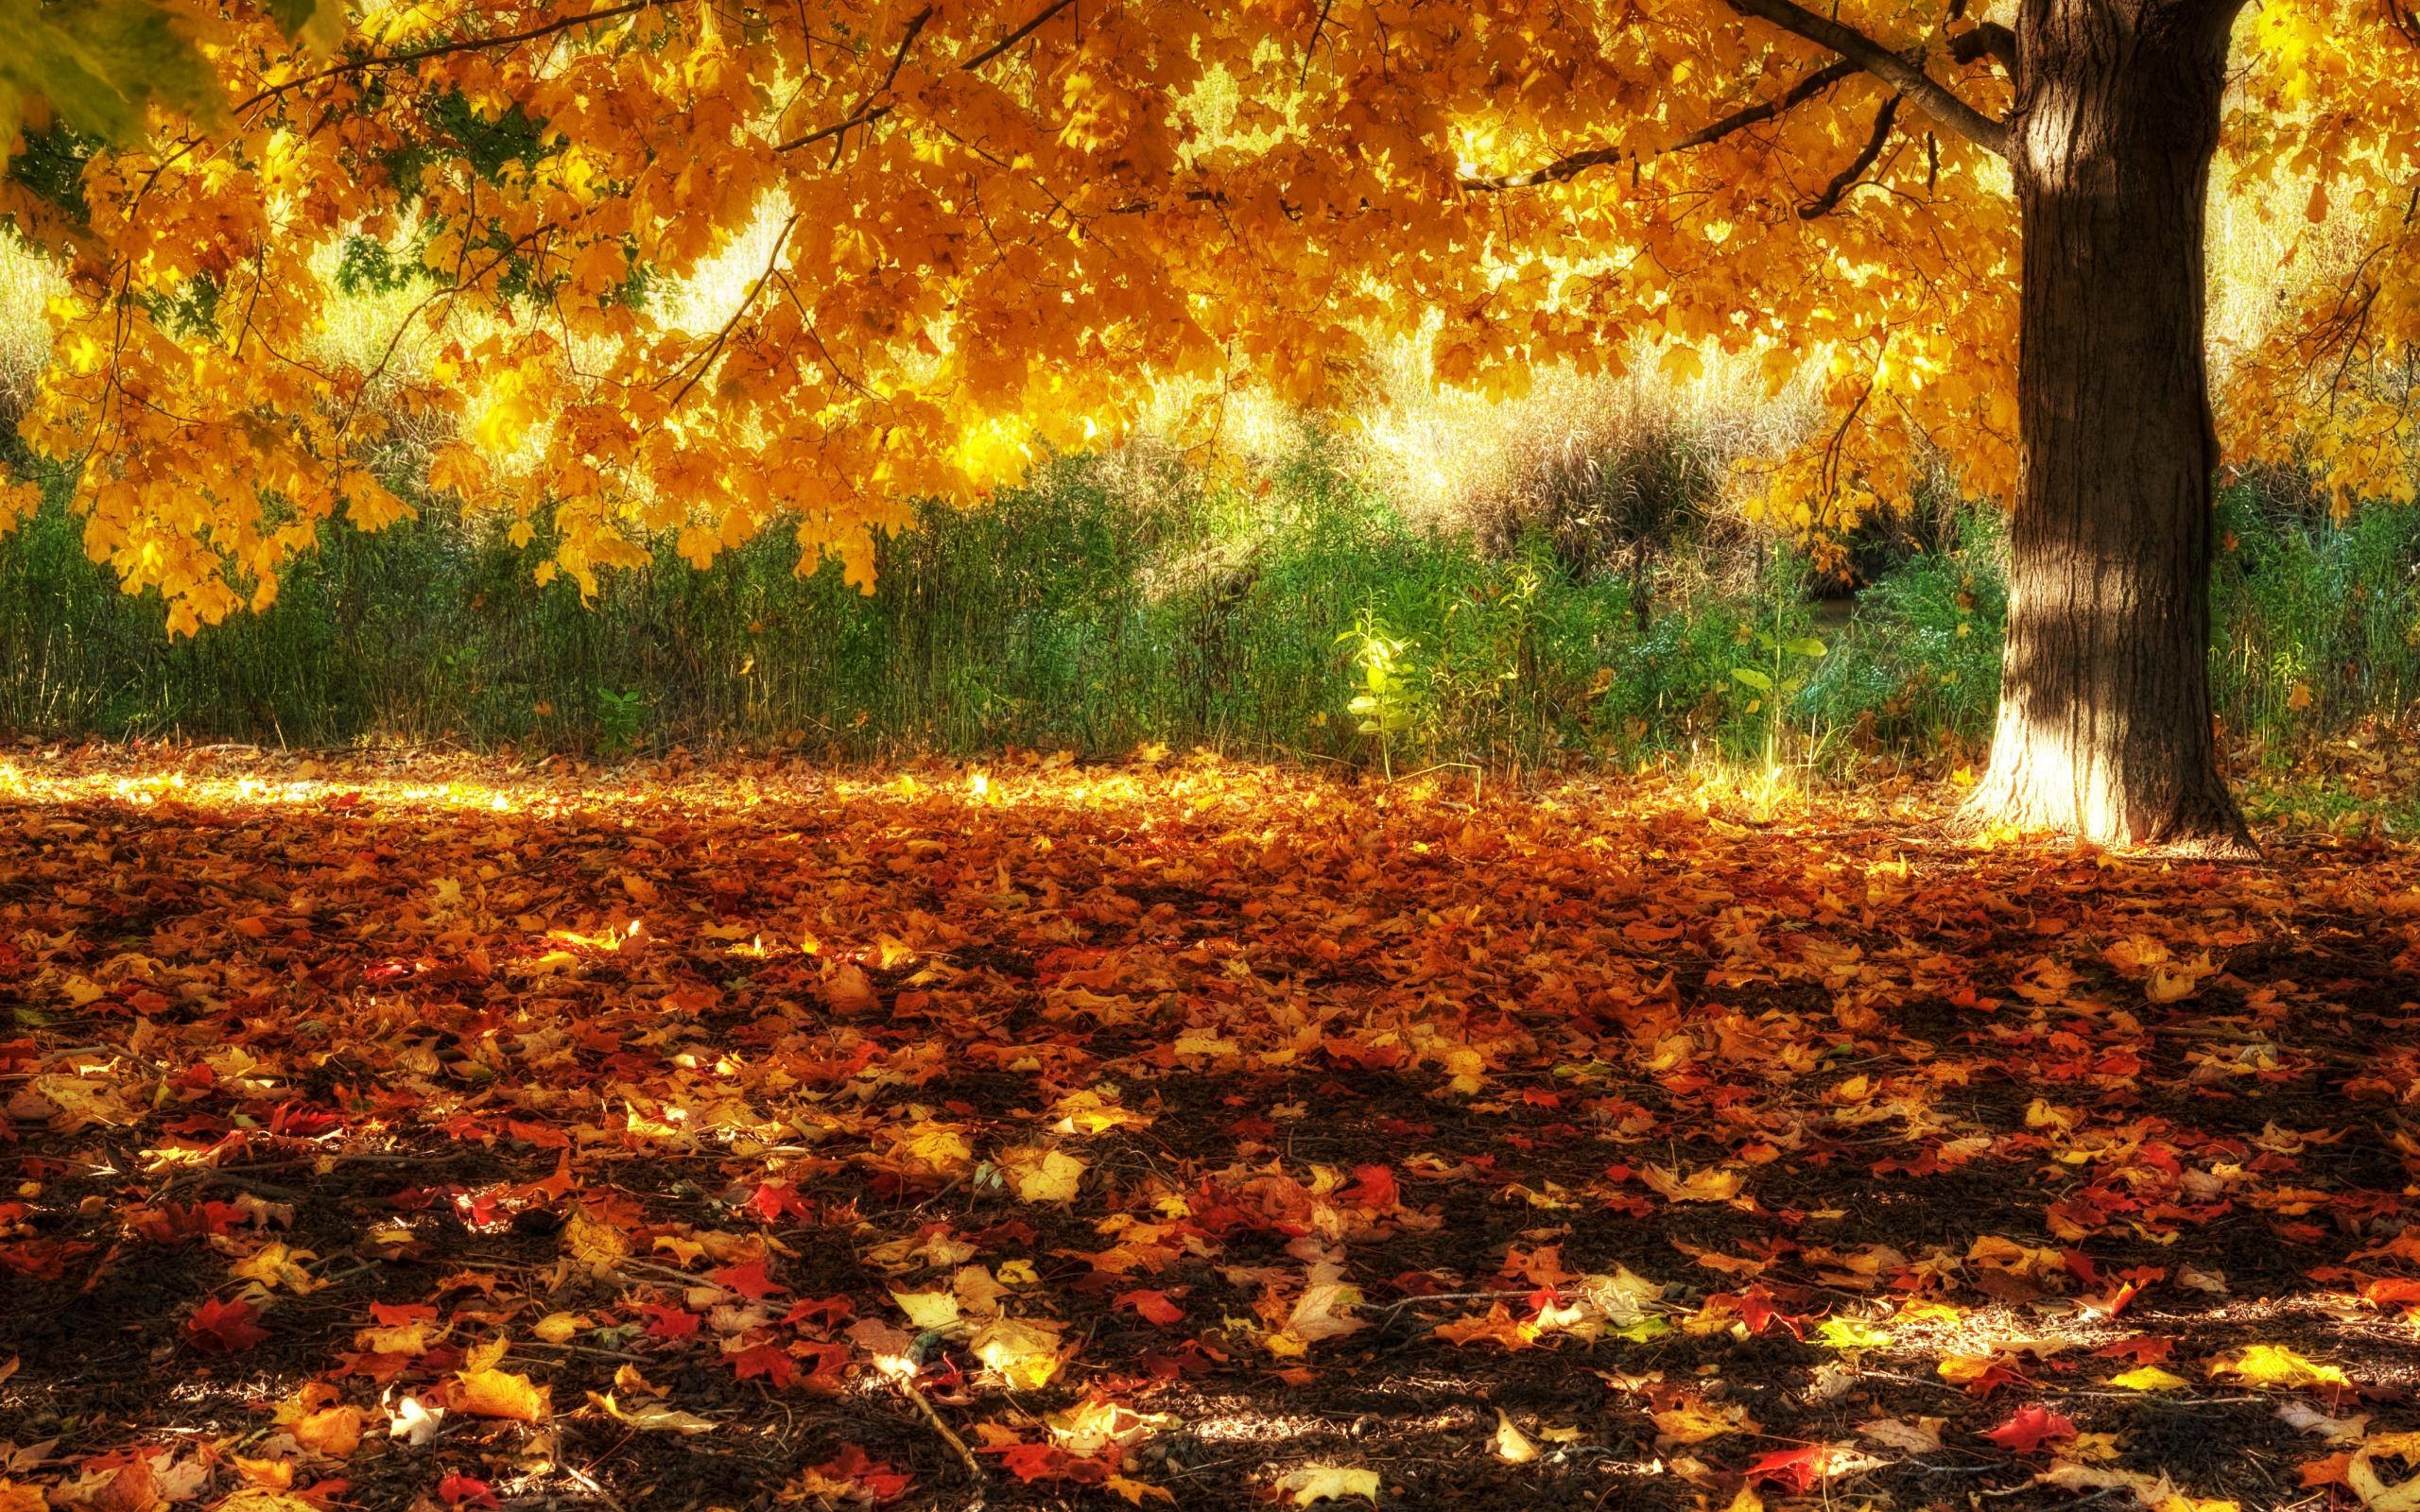 HD Fall Scenery Wallpapers #8194